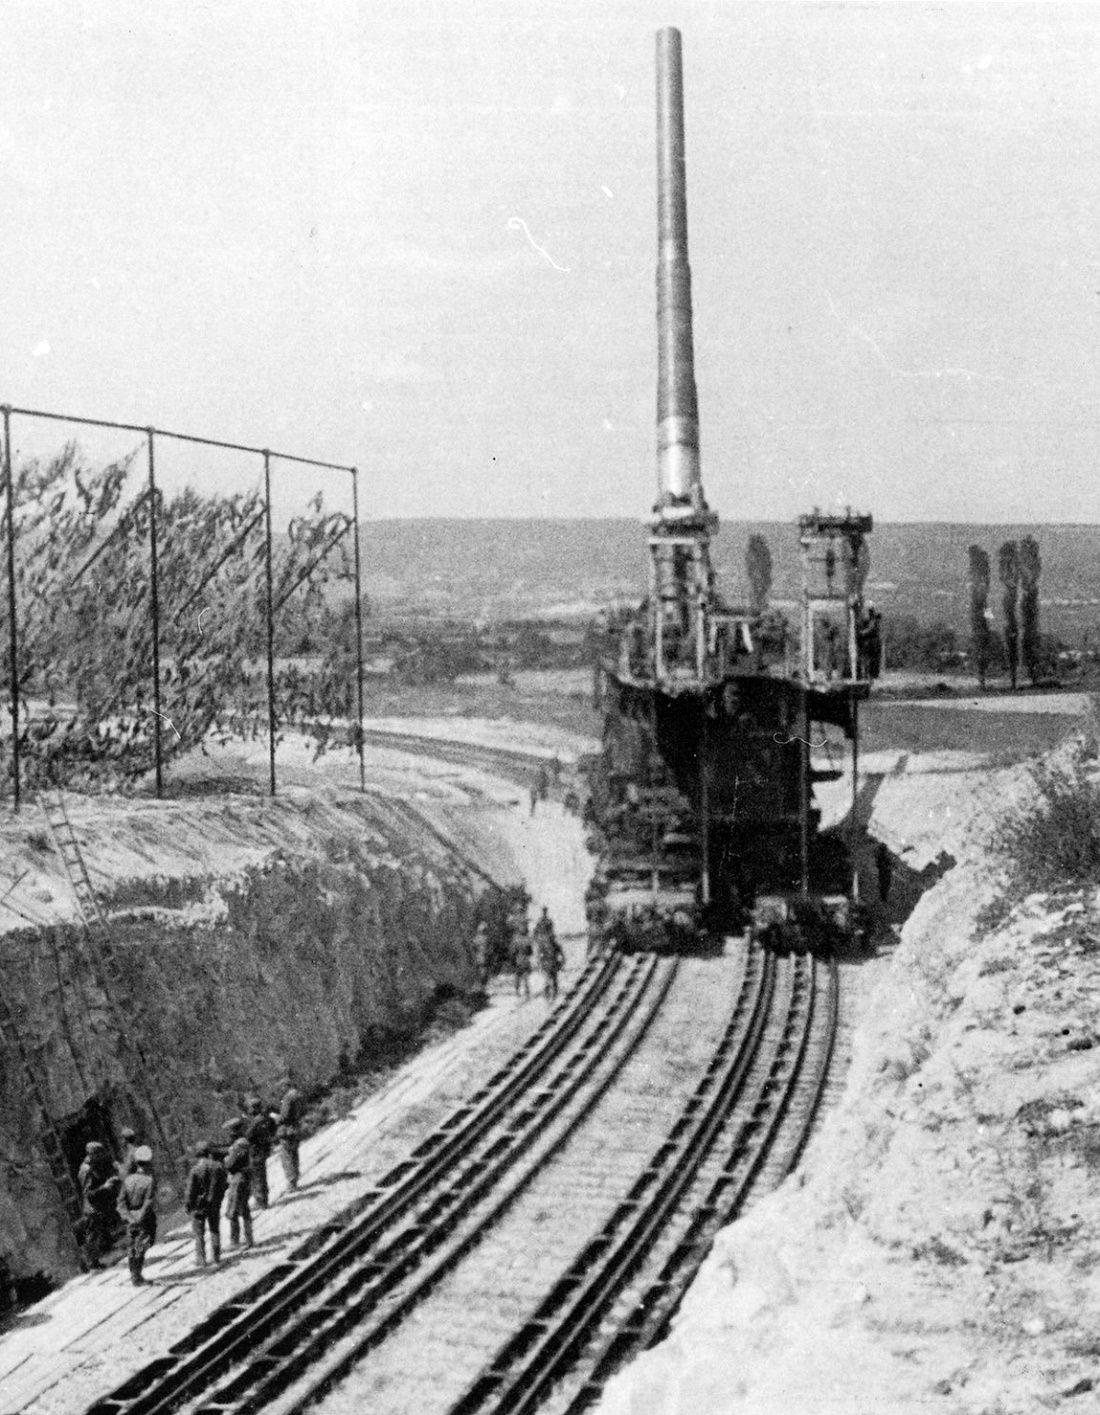 80cm Schwerer Gustav railway gun aimed at Sevastopol ...